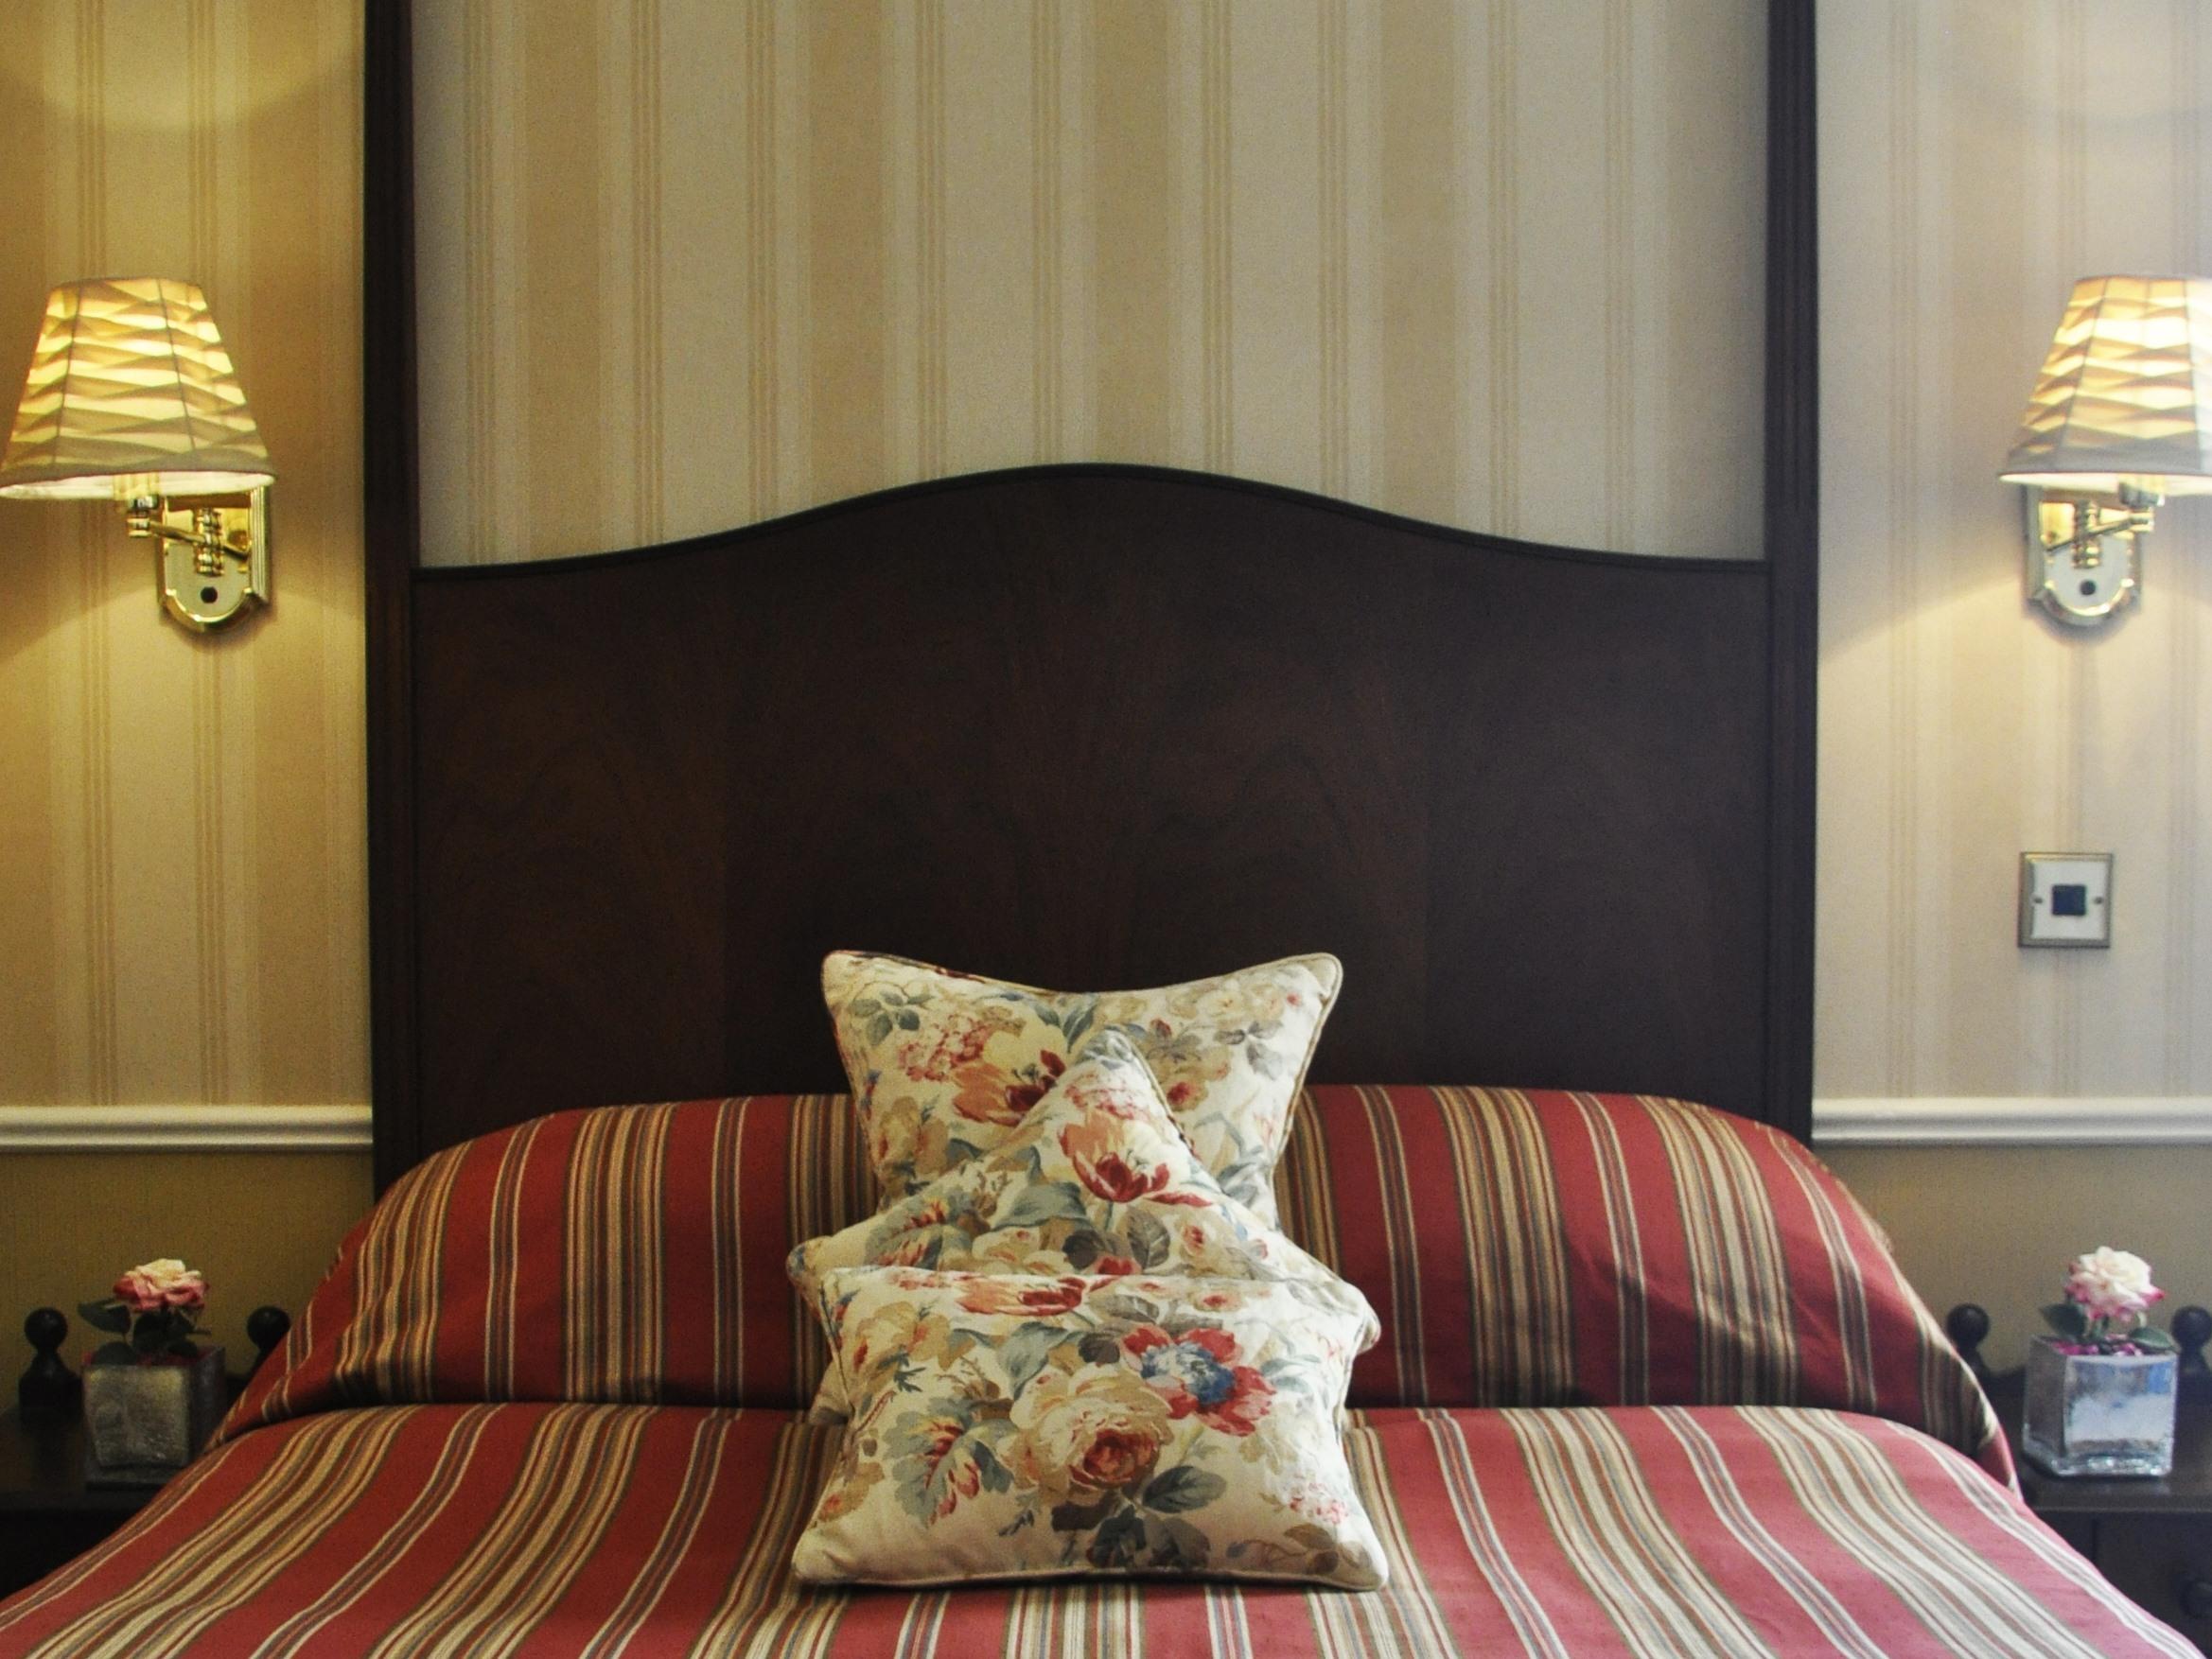 Superior King Room - Ensuite - Bed & Breakfast